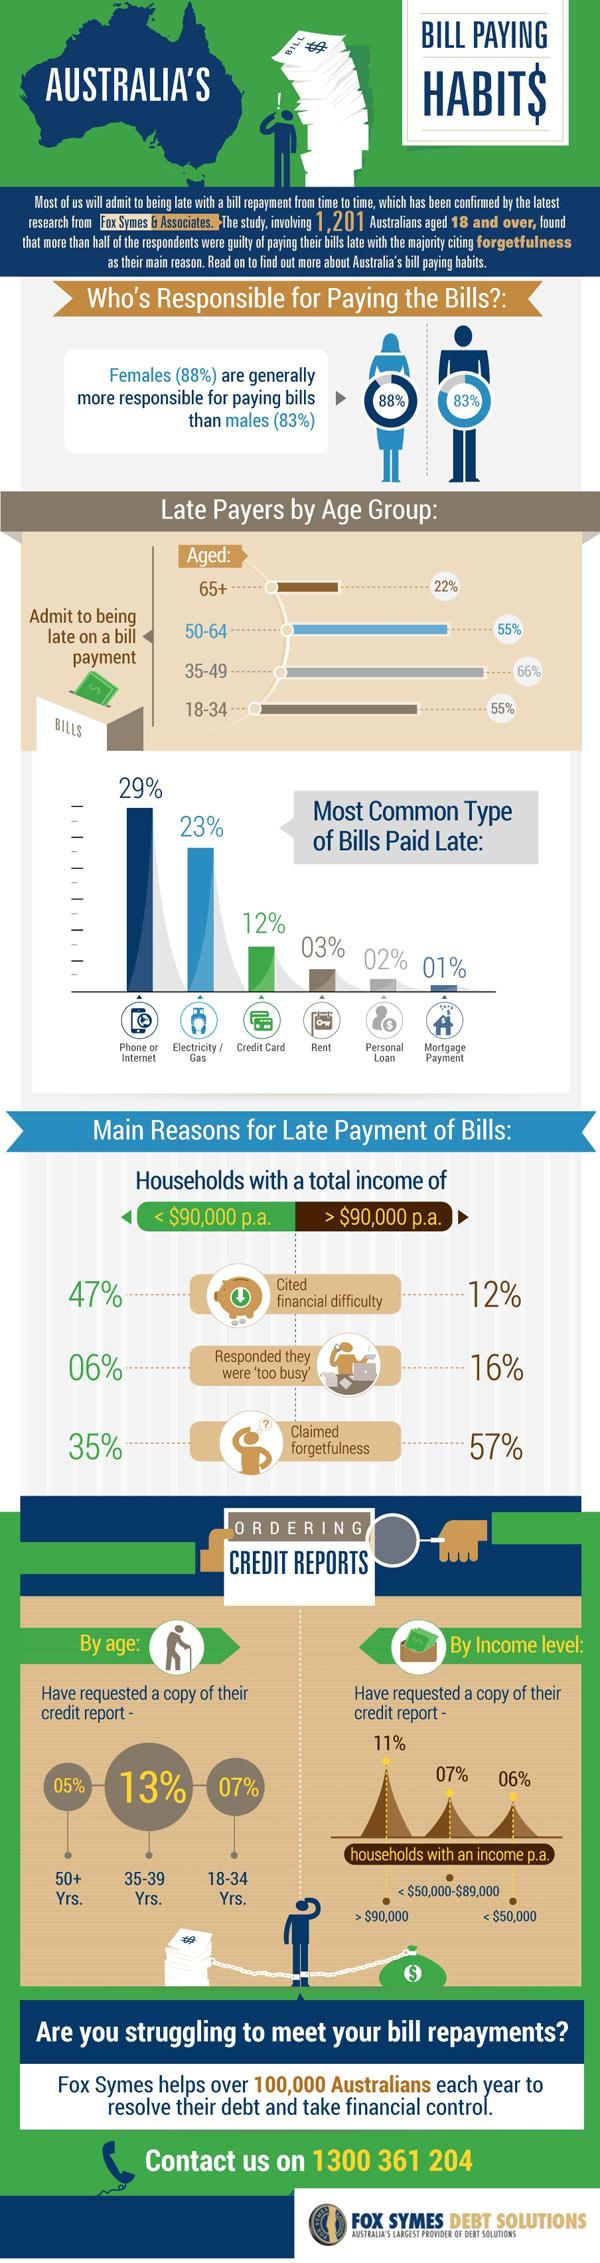 Paying Bills in Australia Infographic